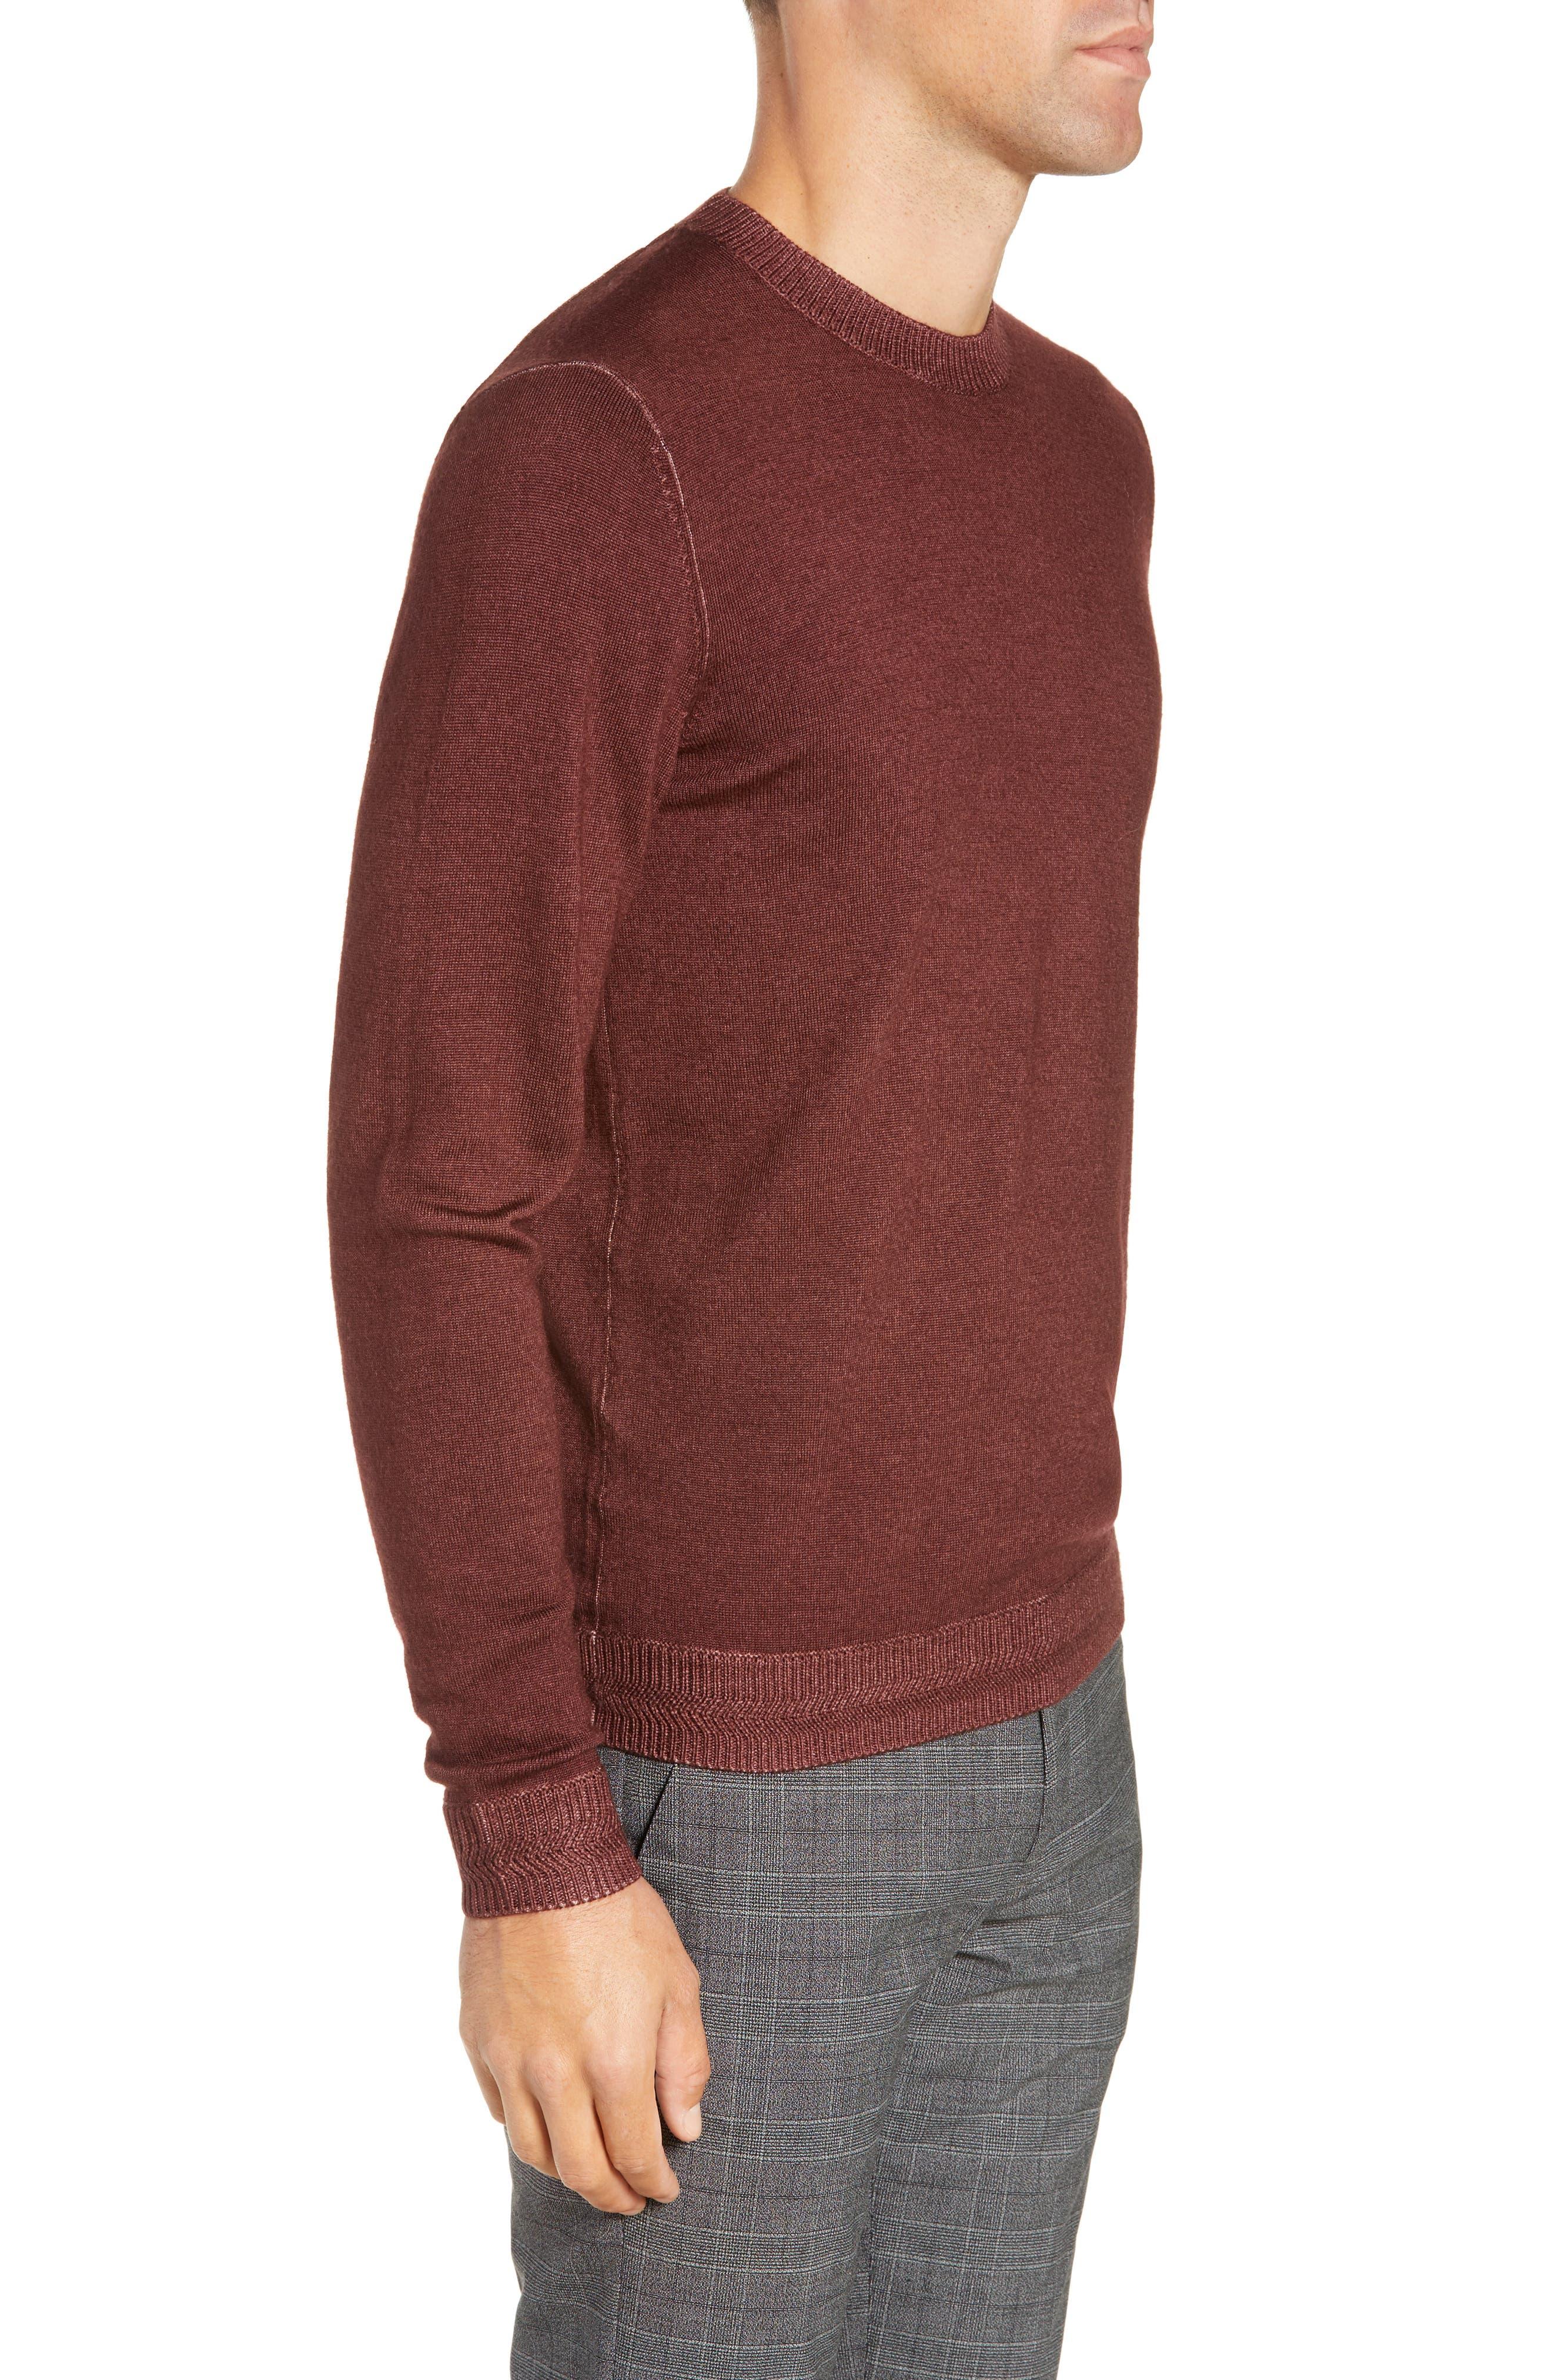 Trim Fit Newab Garment Dyed Wool Sweater,                             Alternate thumbnail 3, color,                             MAROON